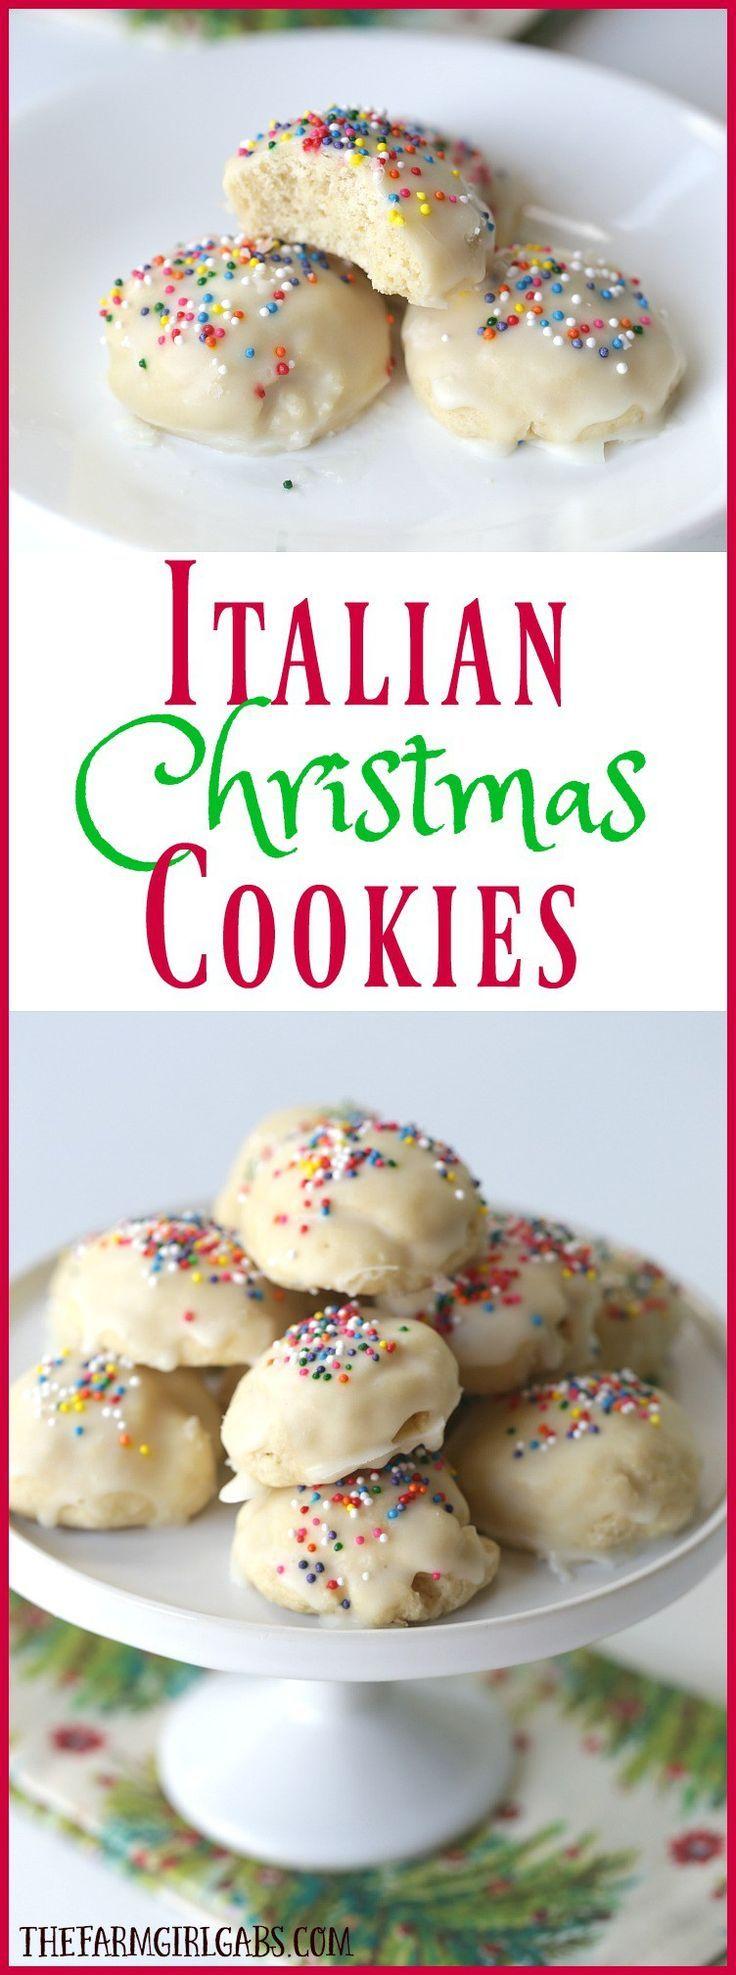 Italian Anise Mini Bundt Cake Recipes